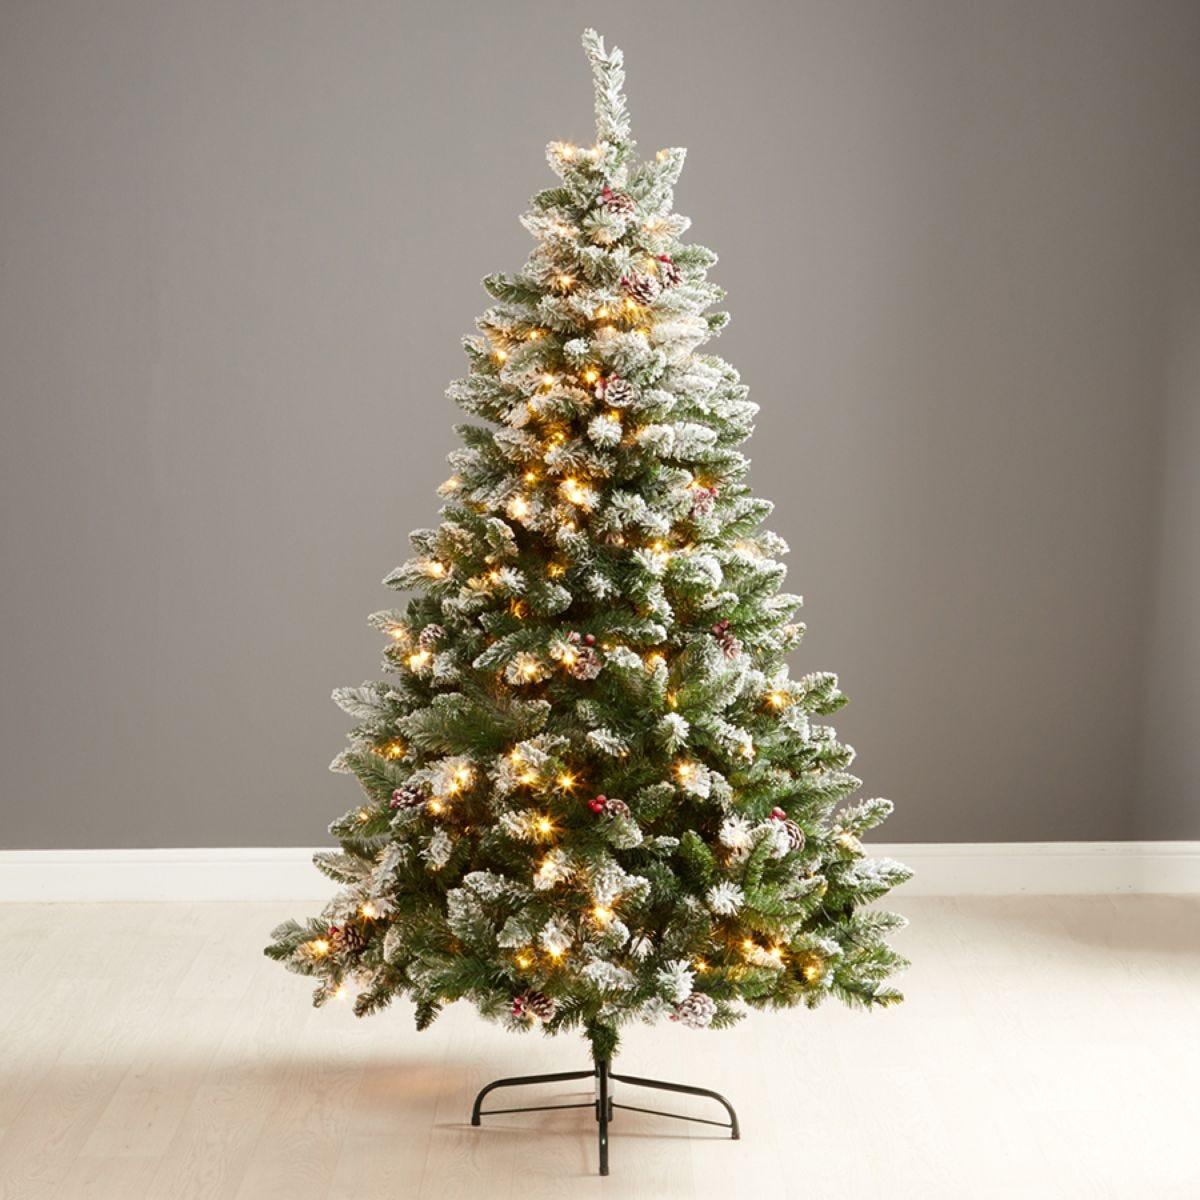 Robert Dyas Pre-Lit Frosted Blenheim Christmas Tree - 6ft